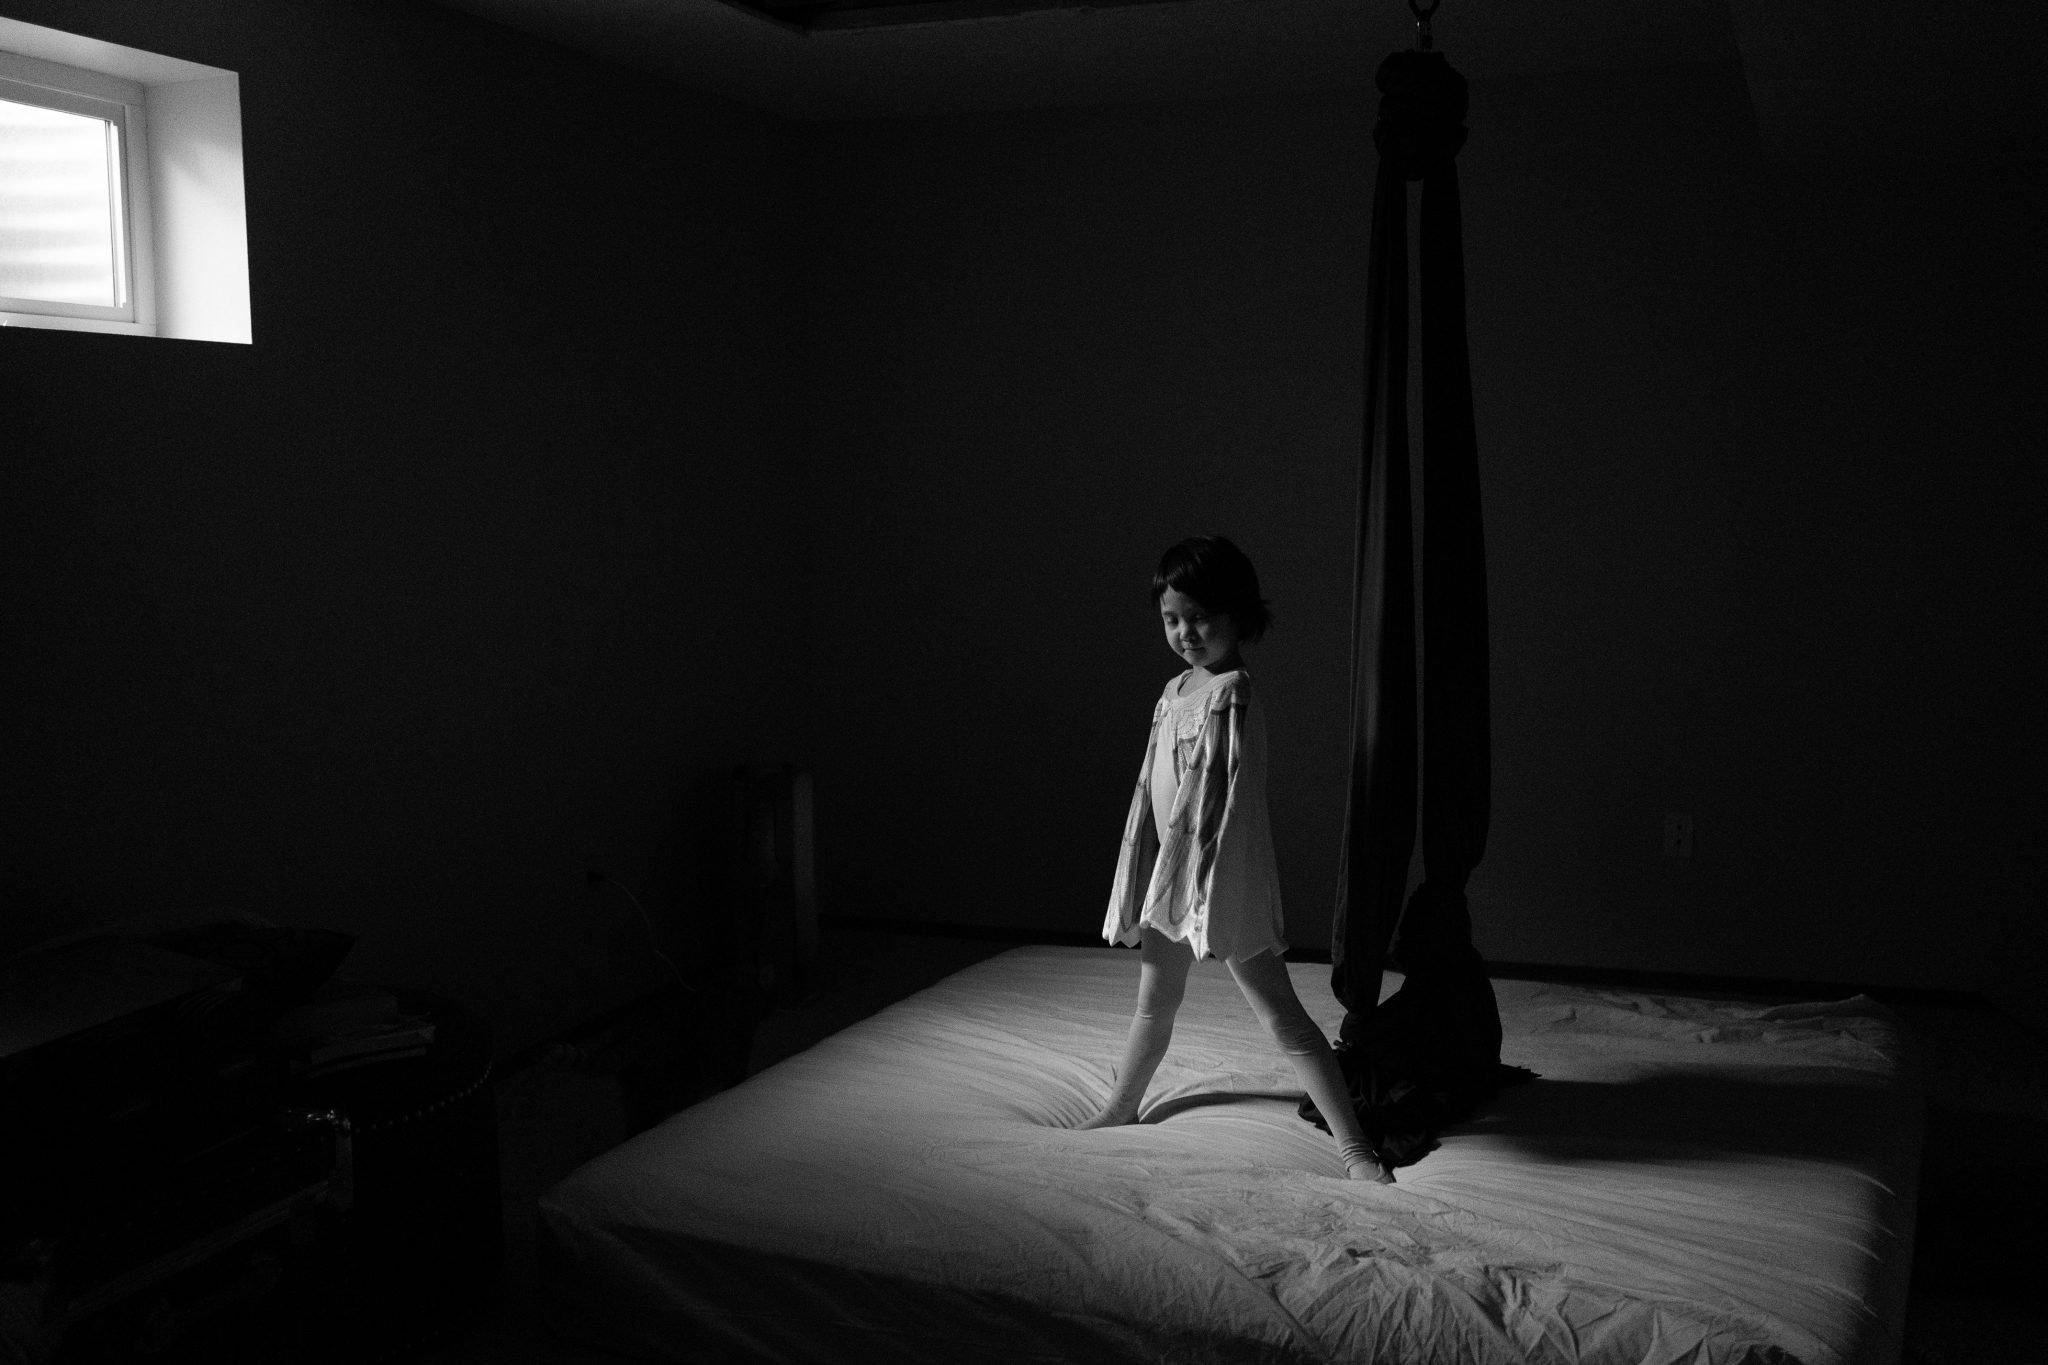 girl in light of window